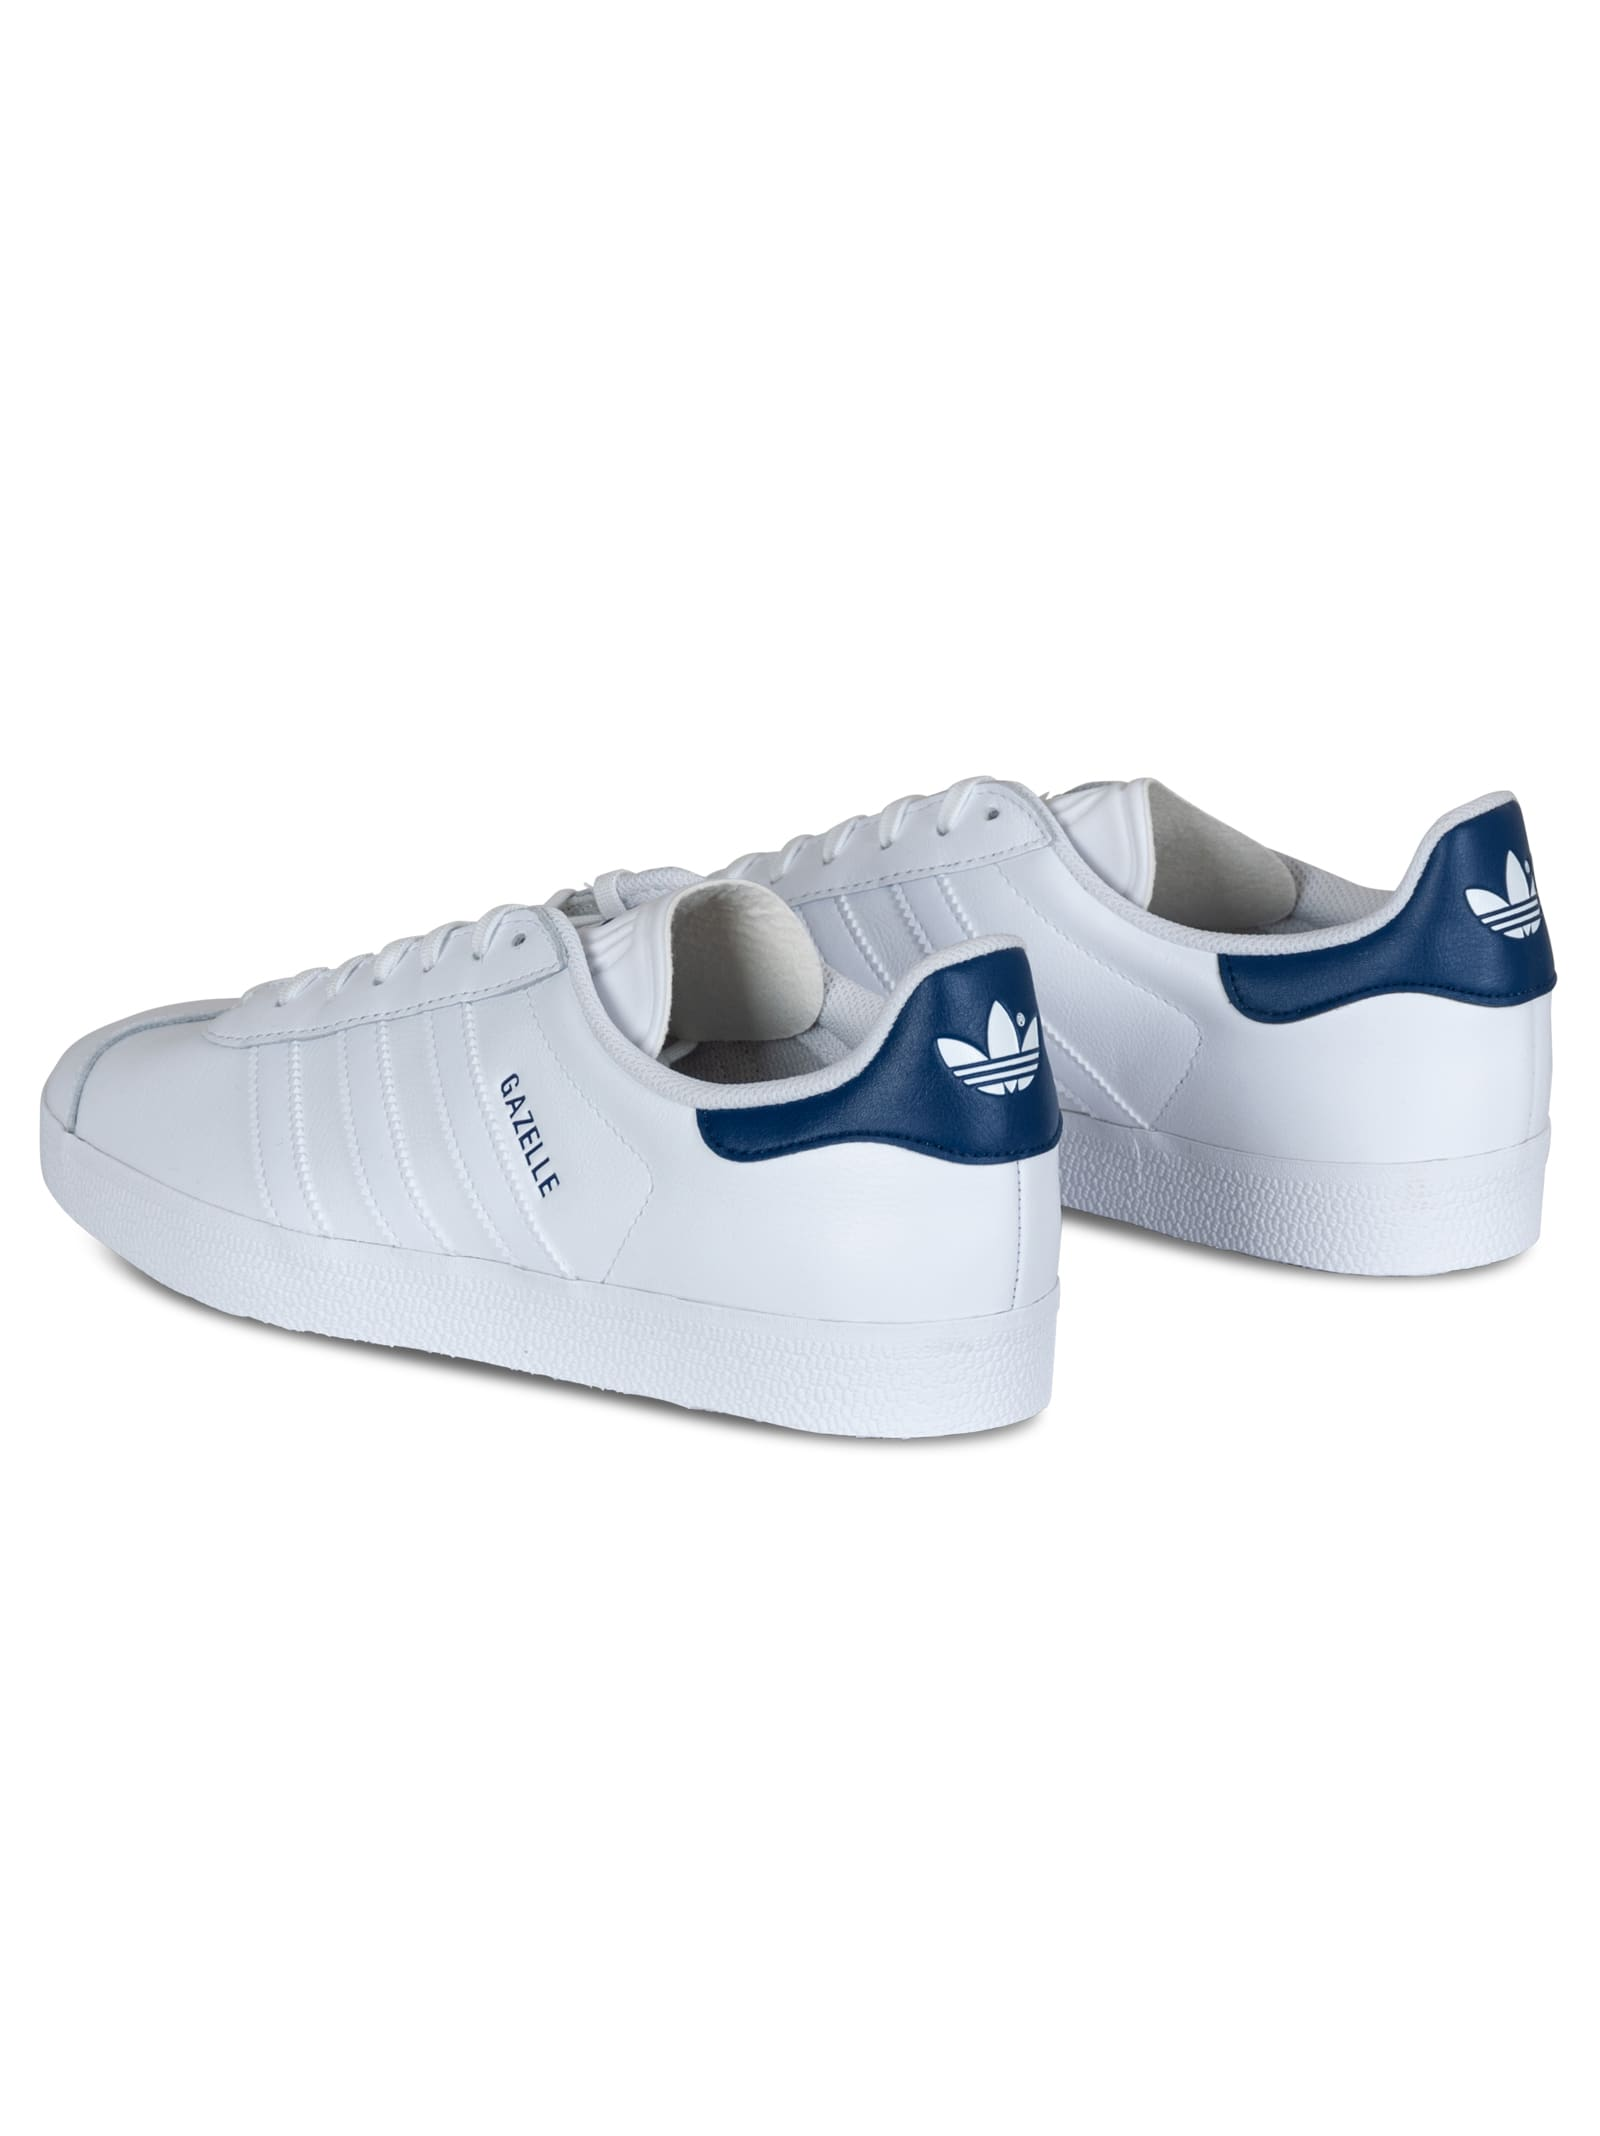 adidas Originals GAZELLE Sneaker low footwear whitedark